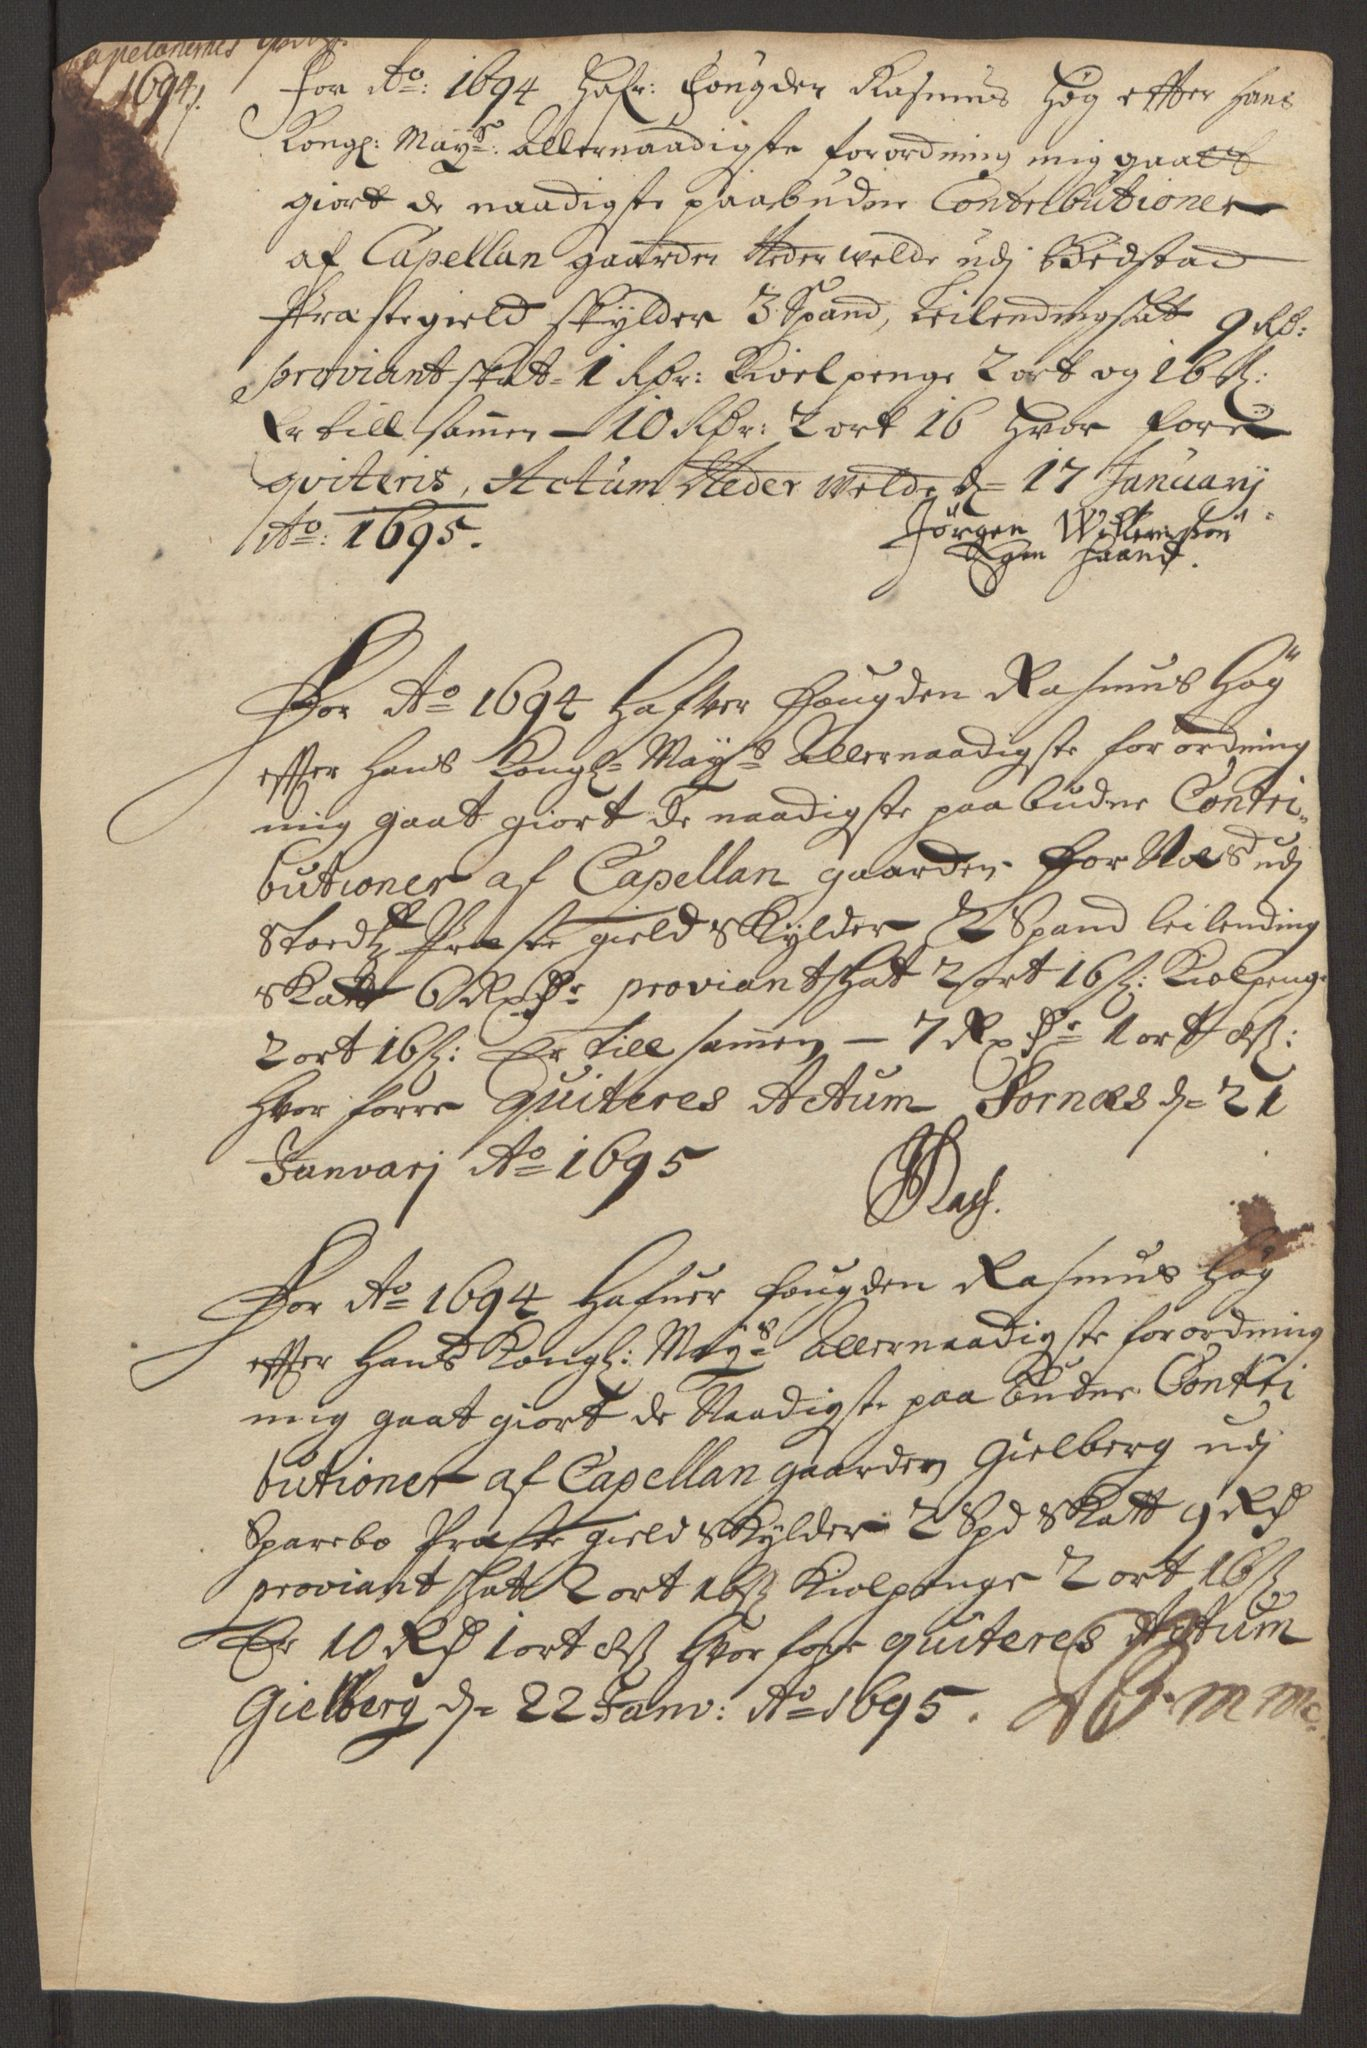 RA, Rentekammeret inntil 1814, Reviderte regnskaper, Fogderegnskap, R63/L4308: Fogderegnskap Inderøy, 1692-1694, s. 613